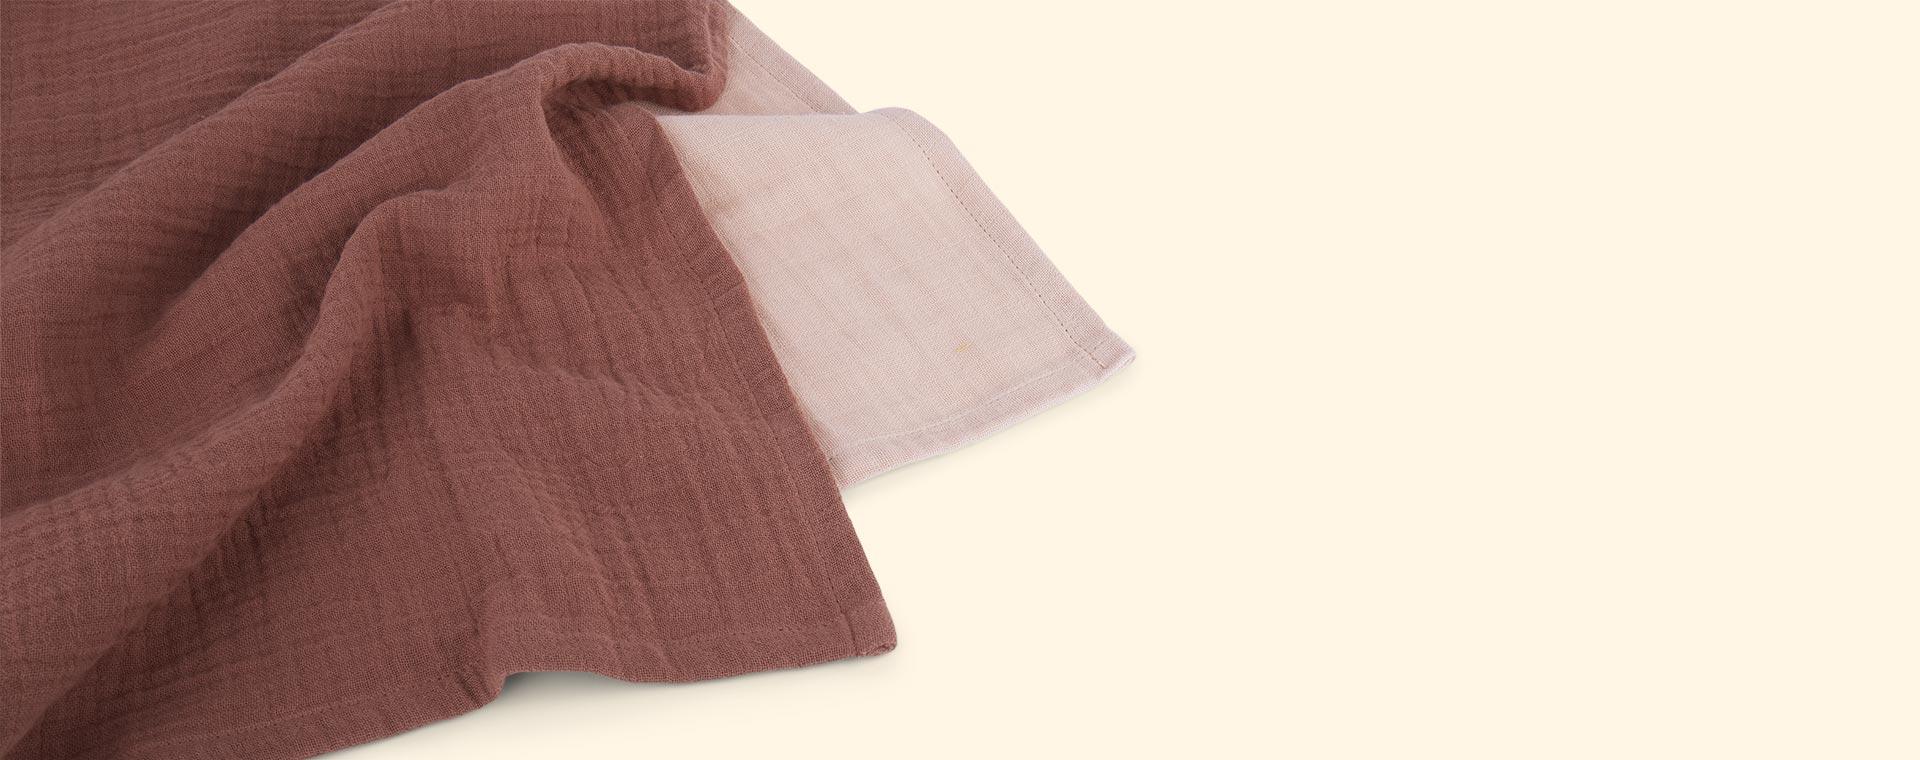 Rose Mix Liewood Leon Muslin Cloth 4 Pack